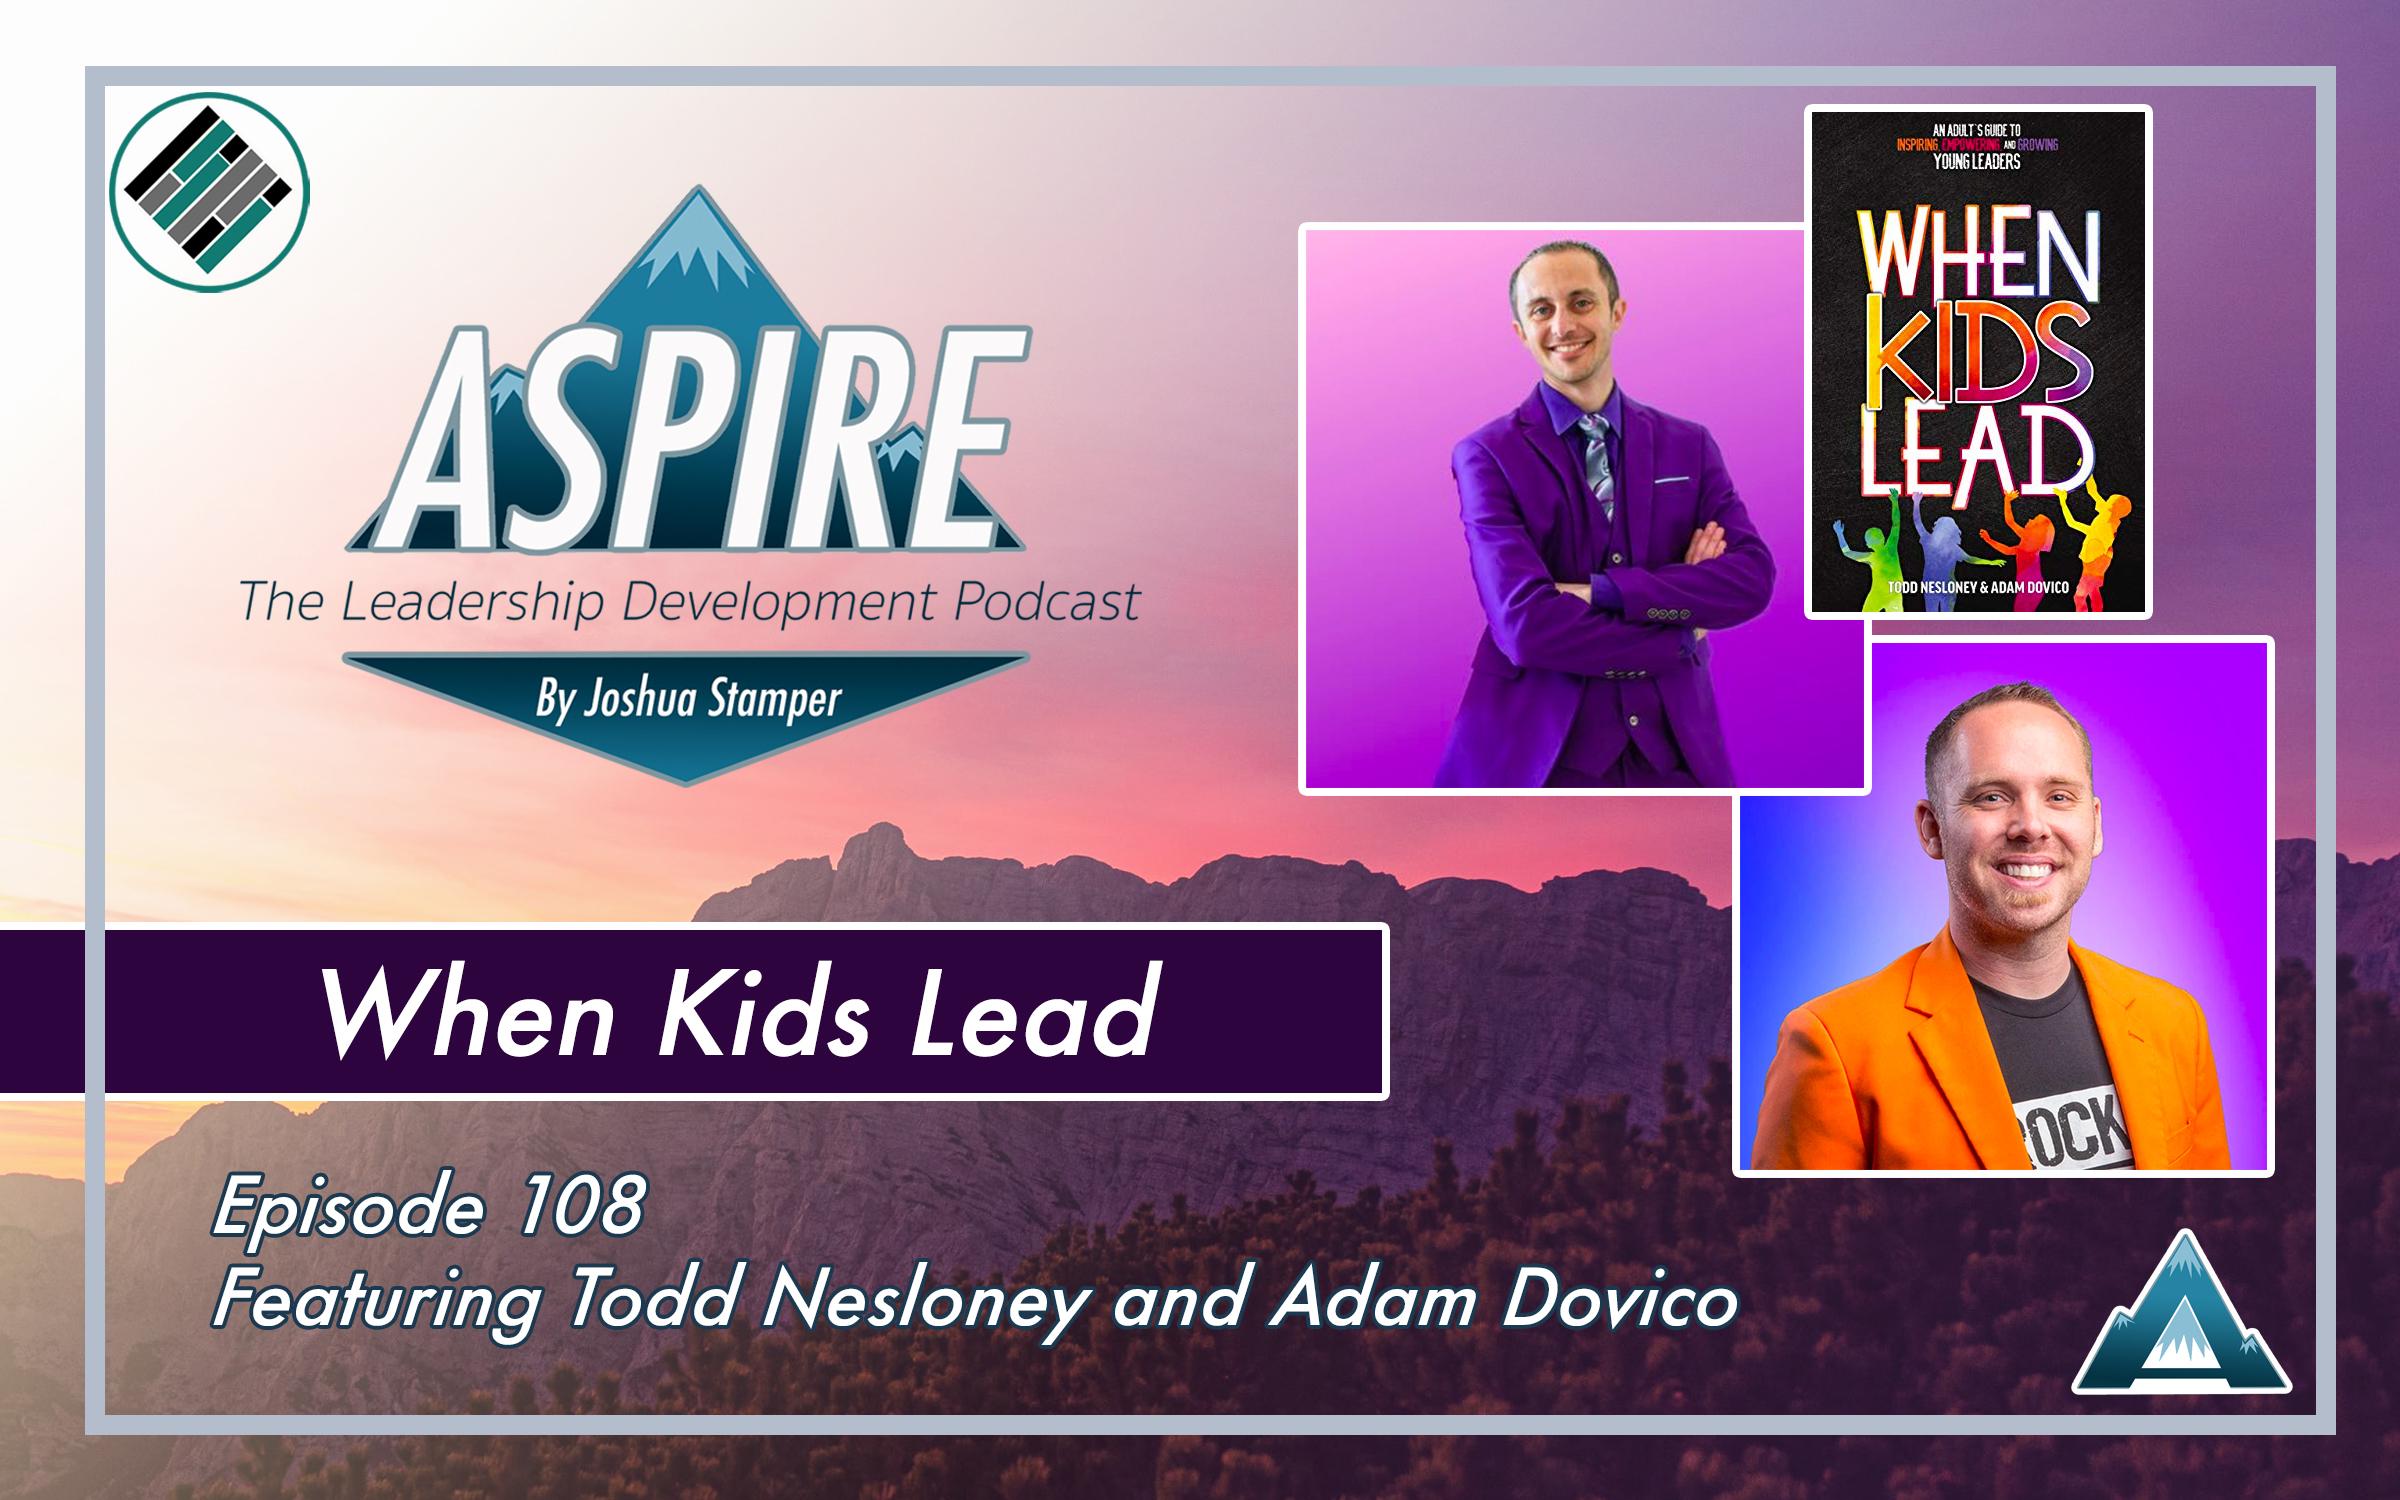 Aspire: The Leadership Development Podcast, Todd Nesloney, Adam Dovico